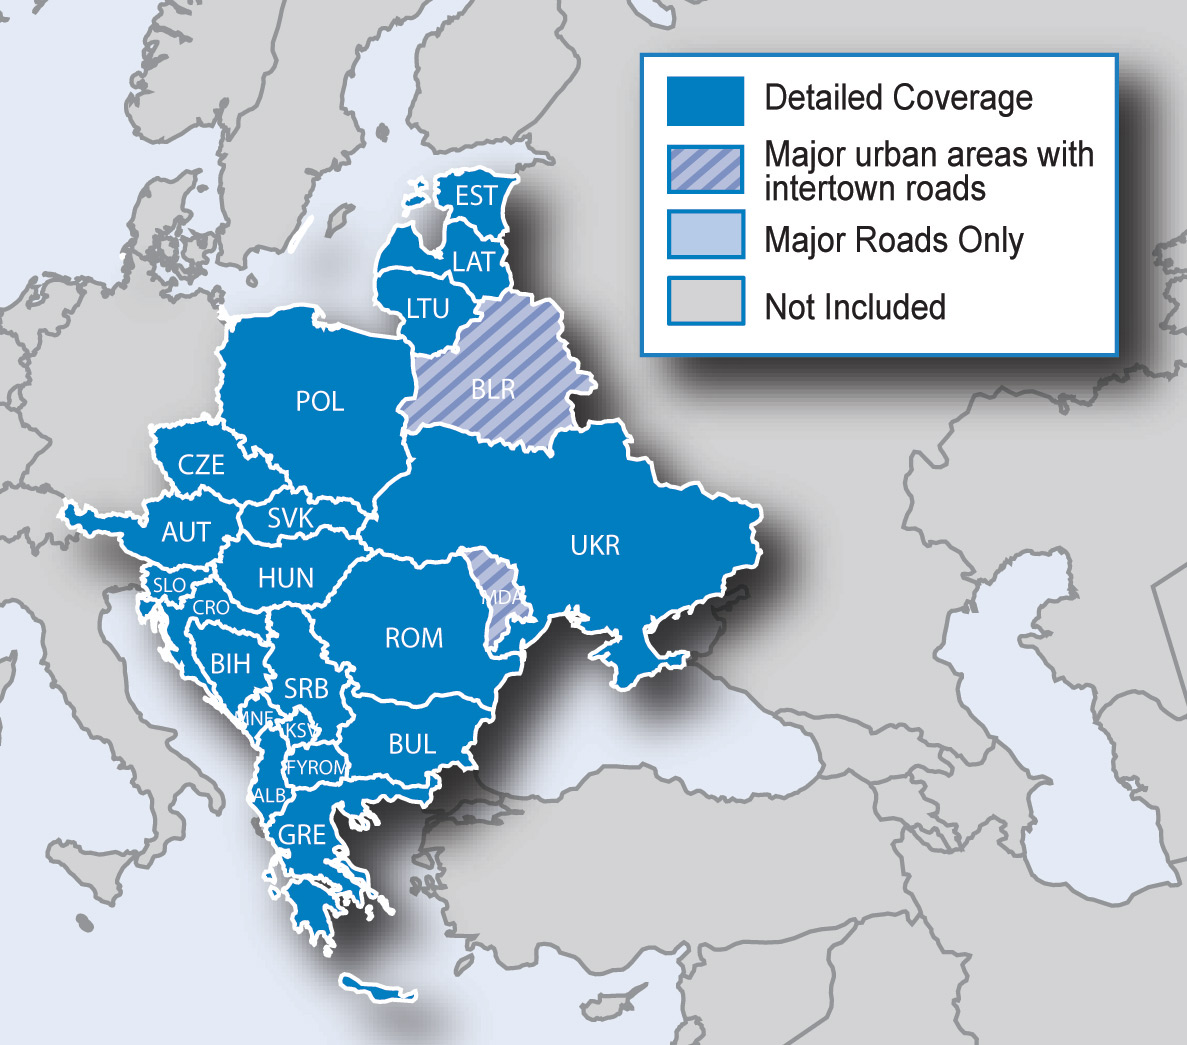 Preloaded Maps en-GB | Garmin | United Kingdom on italy topographic map, cortina italy map, google earth italy map, vodafone italy map, vittoria italy map, crayola italy map, la spezia italy map,